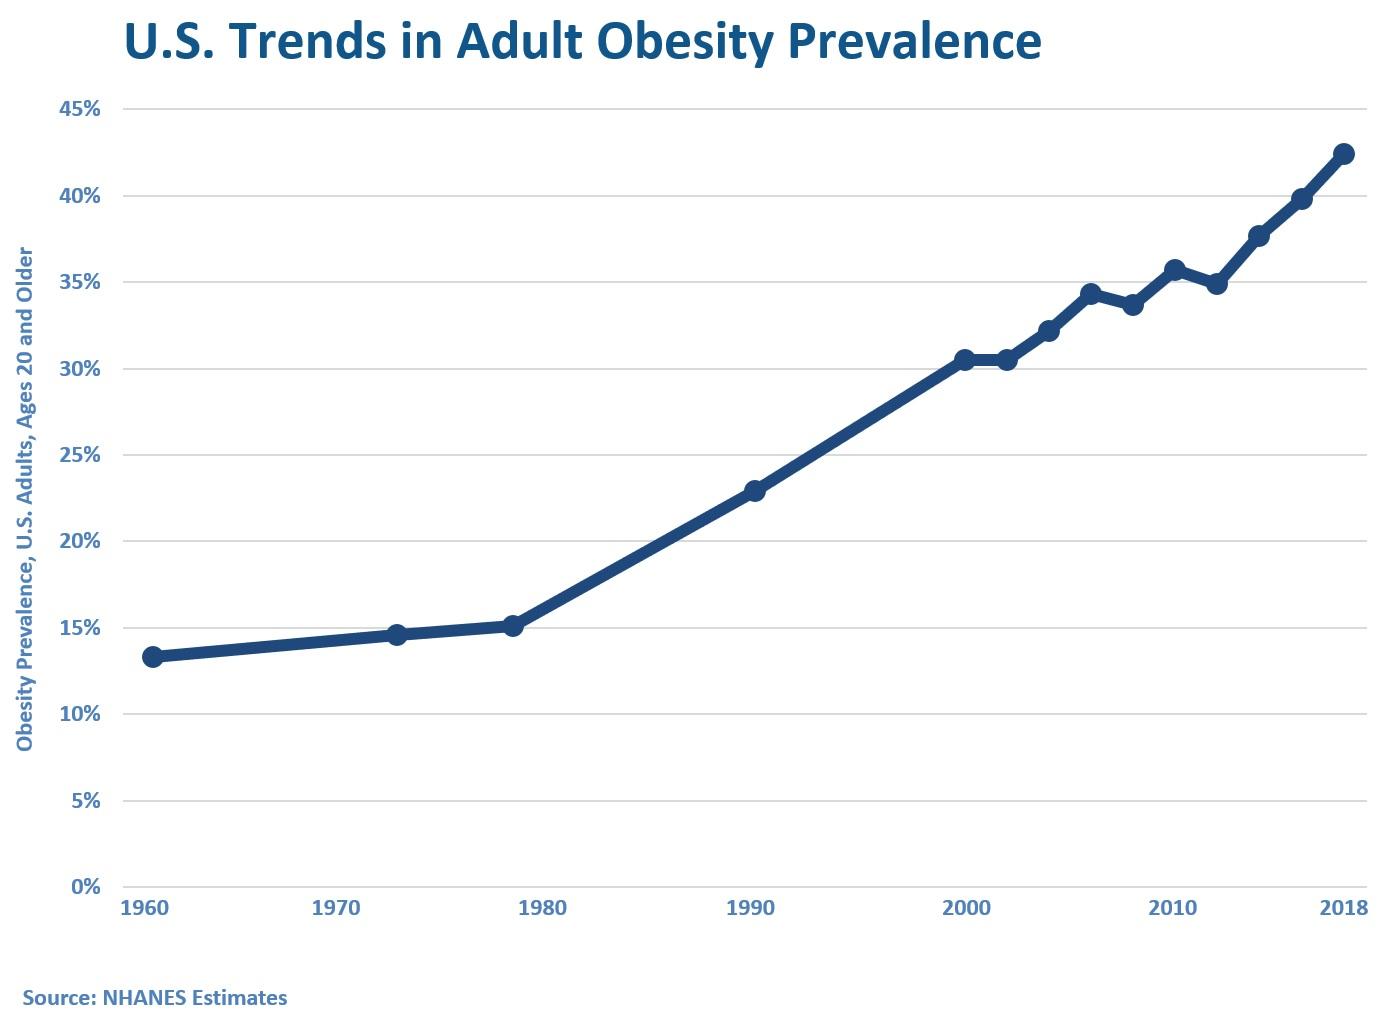 U.S. Trends in Adult Obesity Prevalence